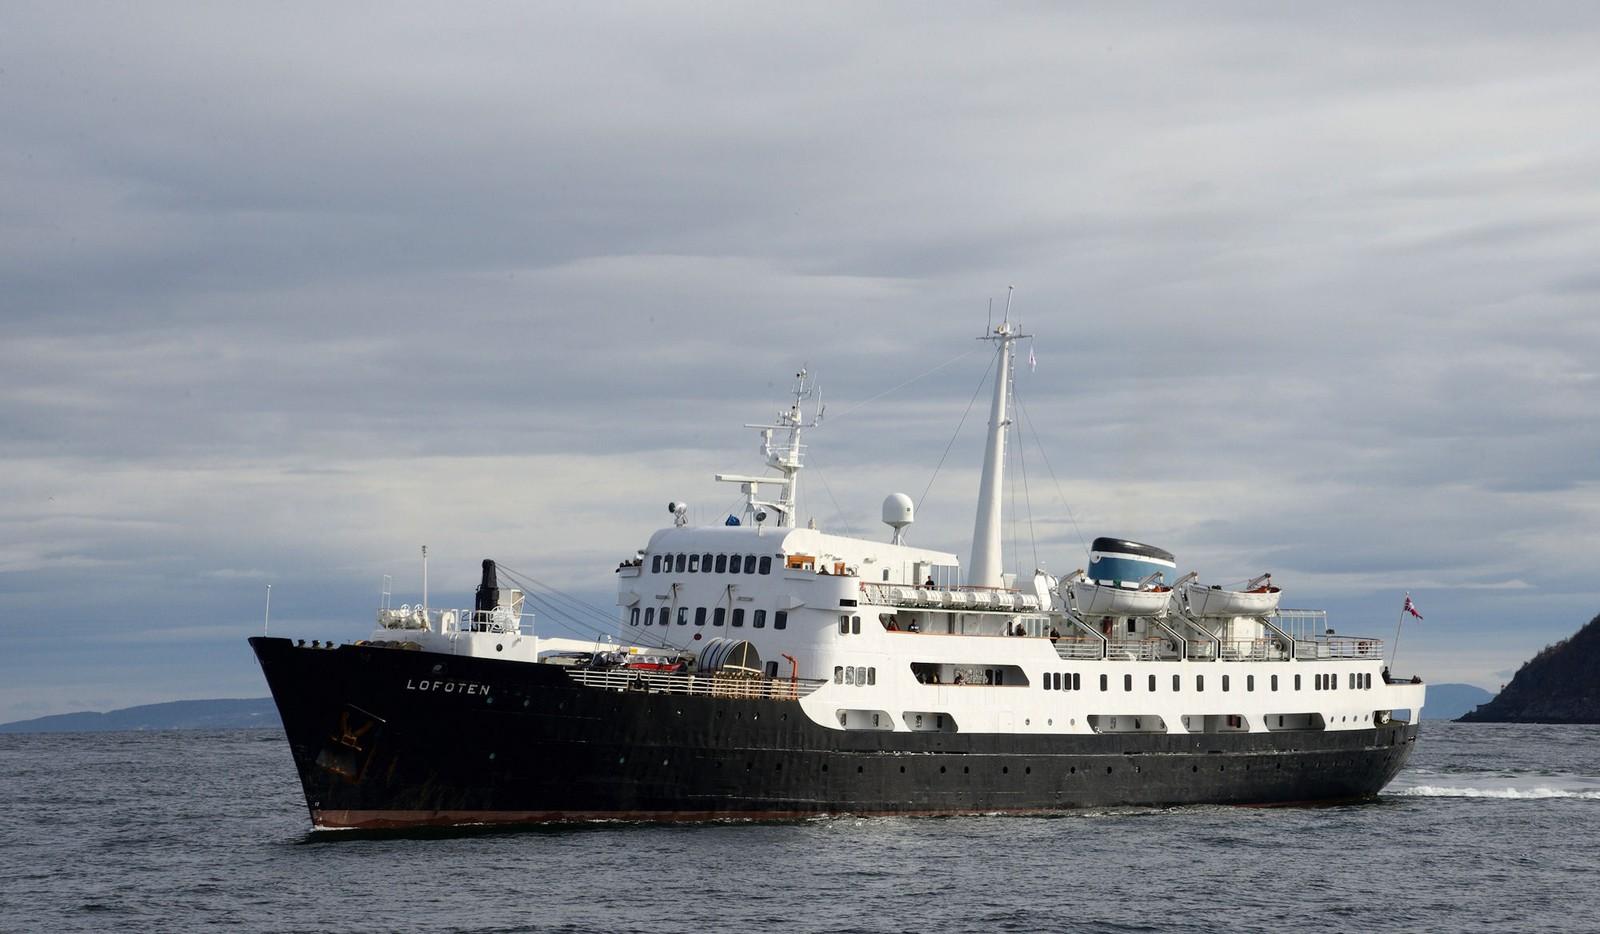 MS Lofoten på Trondheimsfjorden